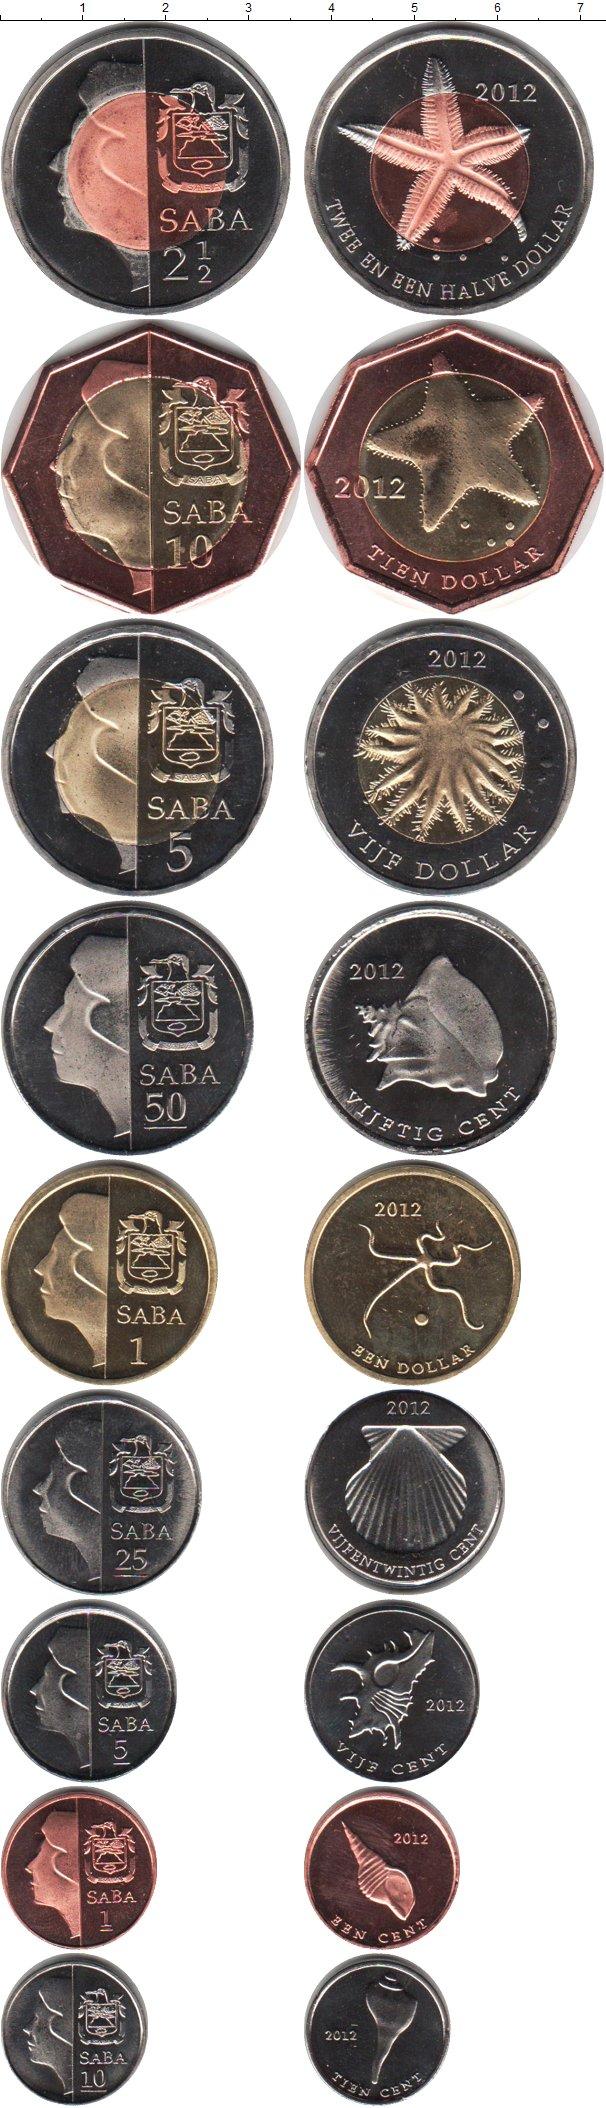 Картинка Наборы монет Саба Саба 2012  2012